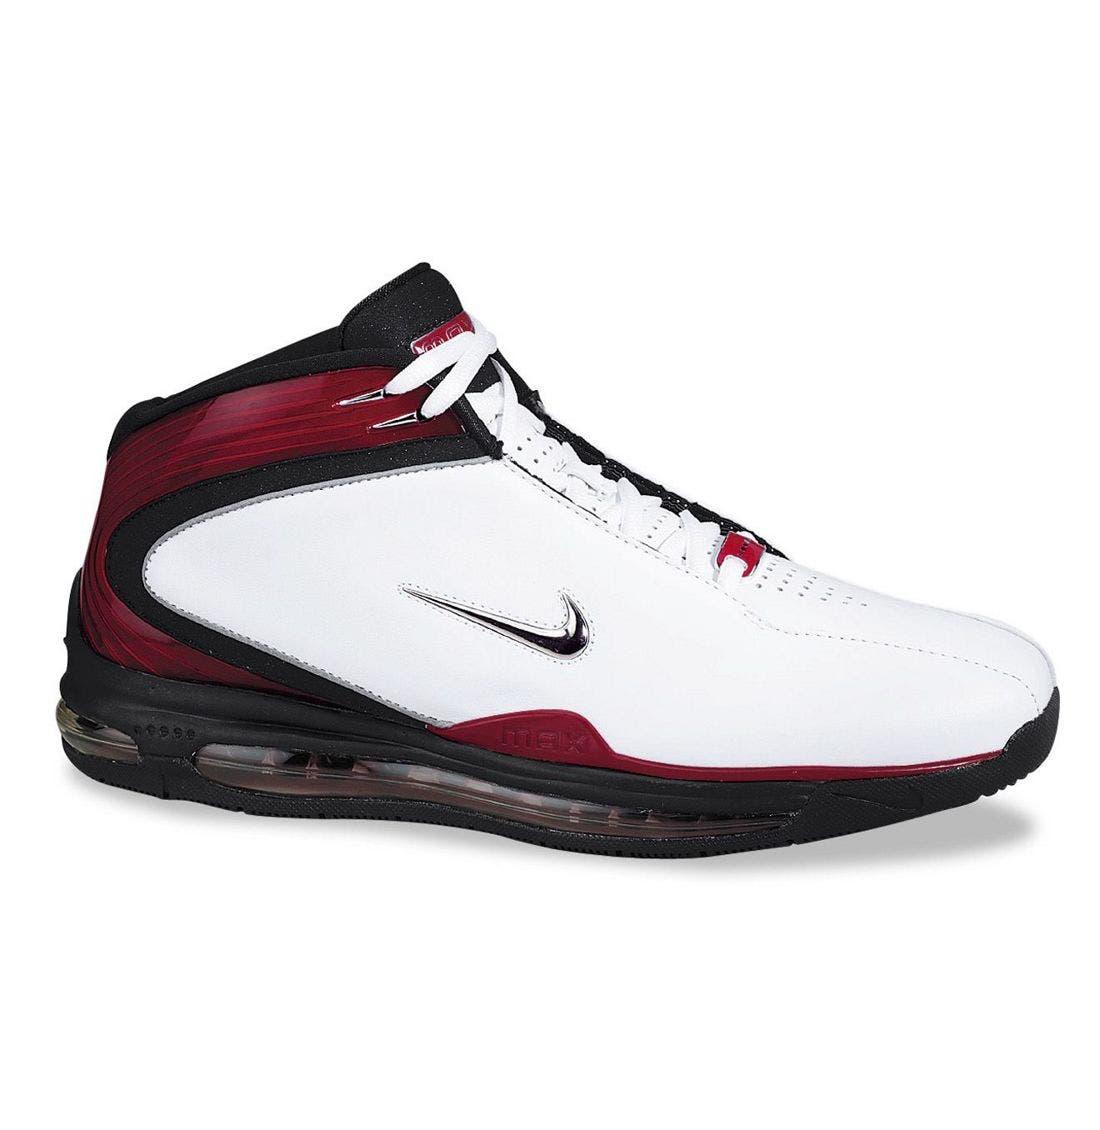 Main Image - Nike 'Air Max Finisher' Basketball Shoe (Men)